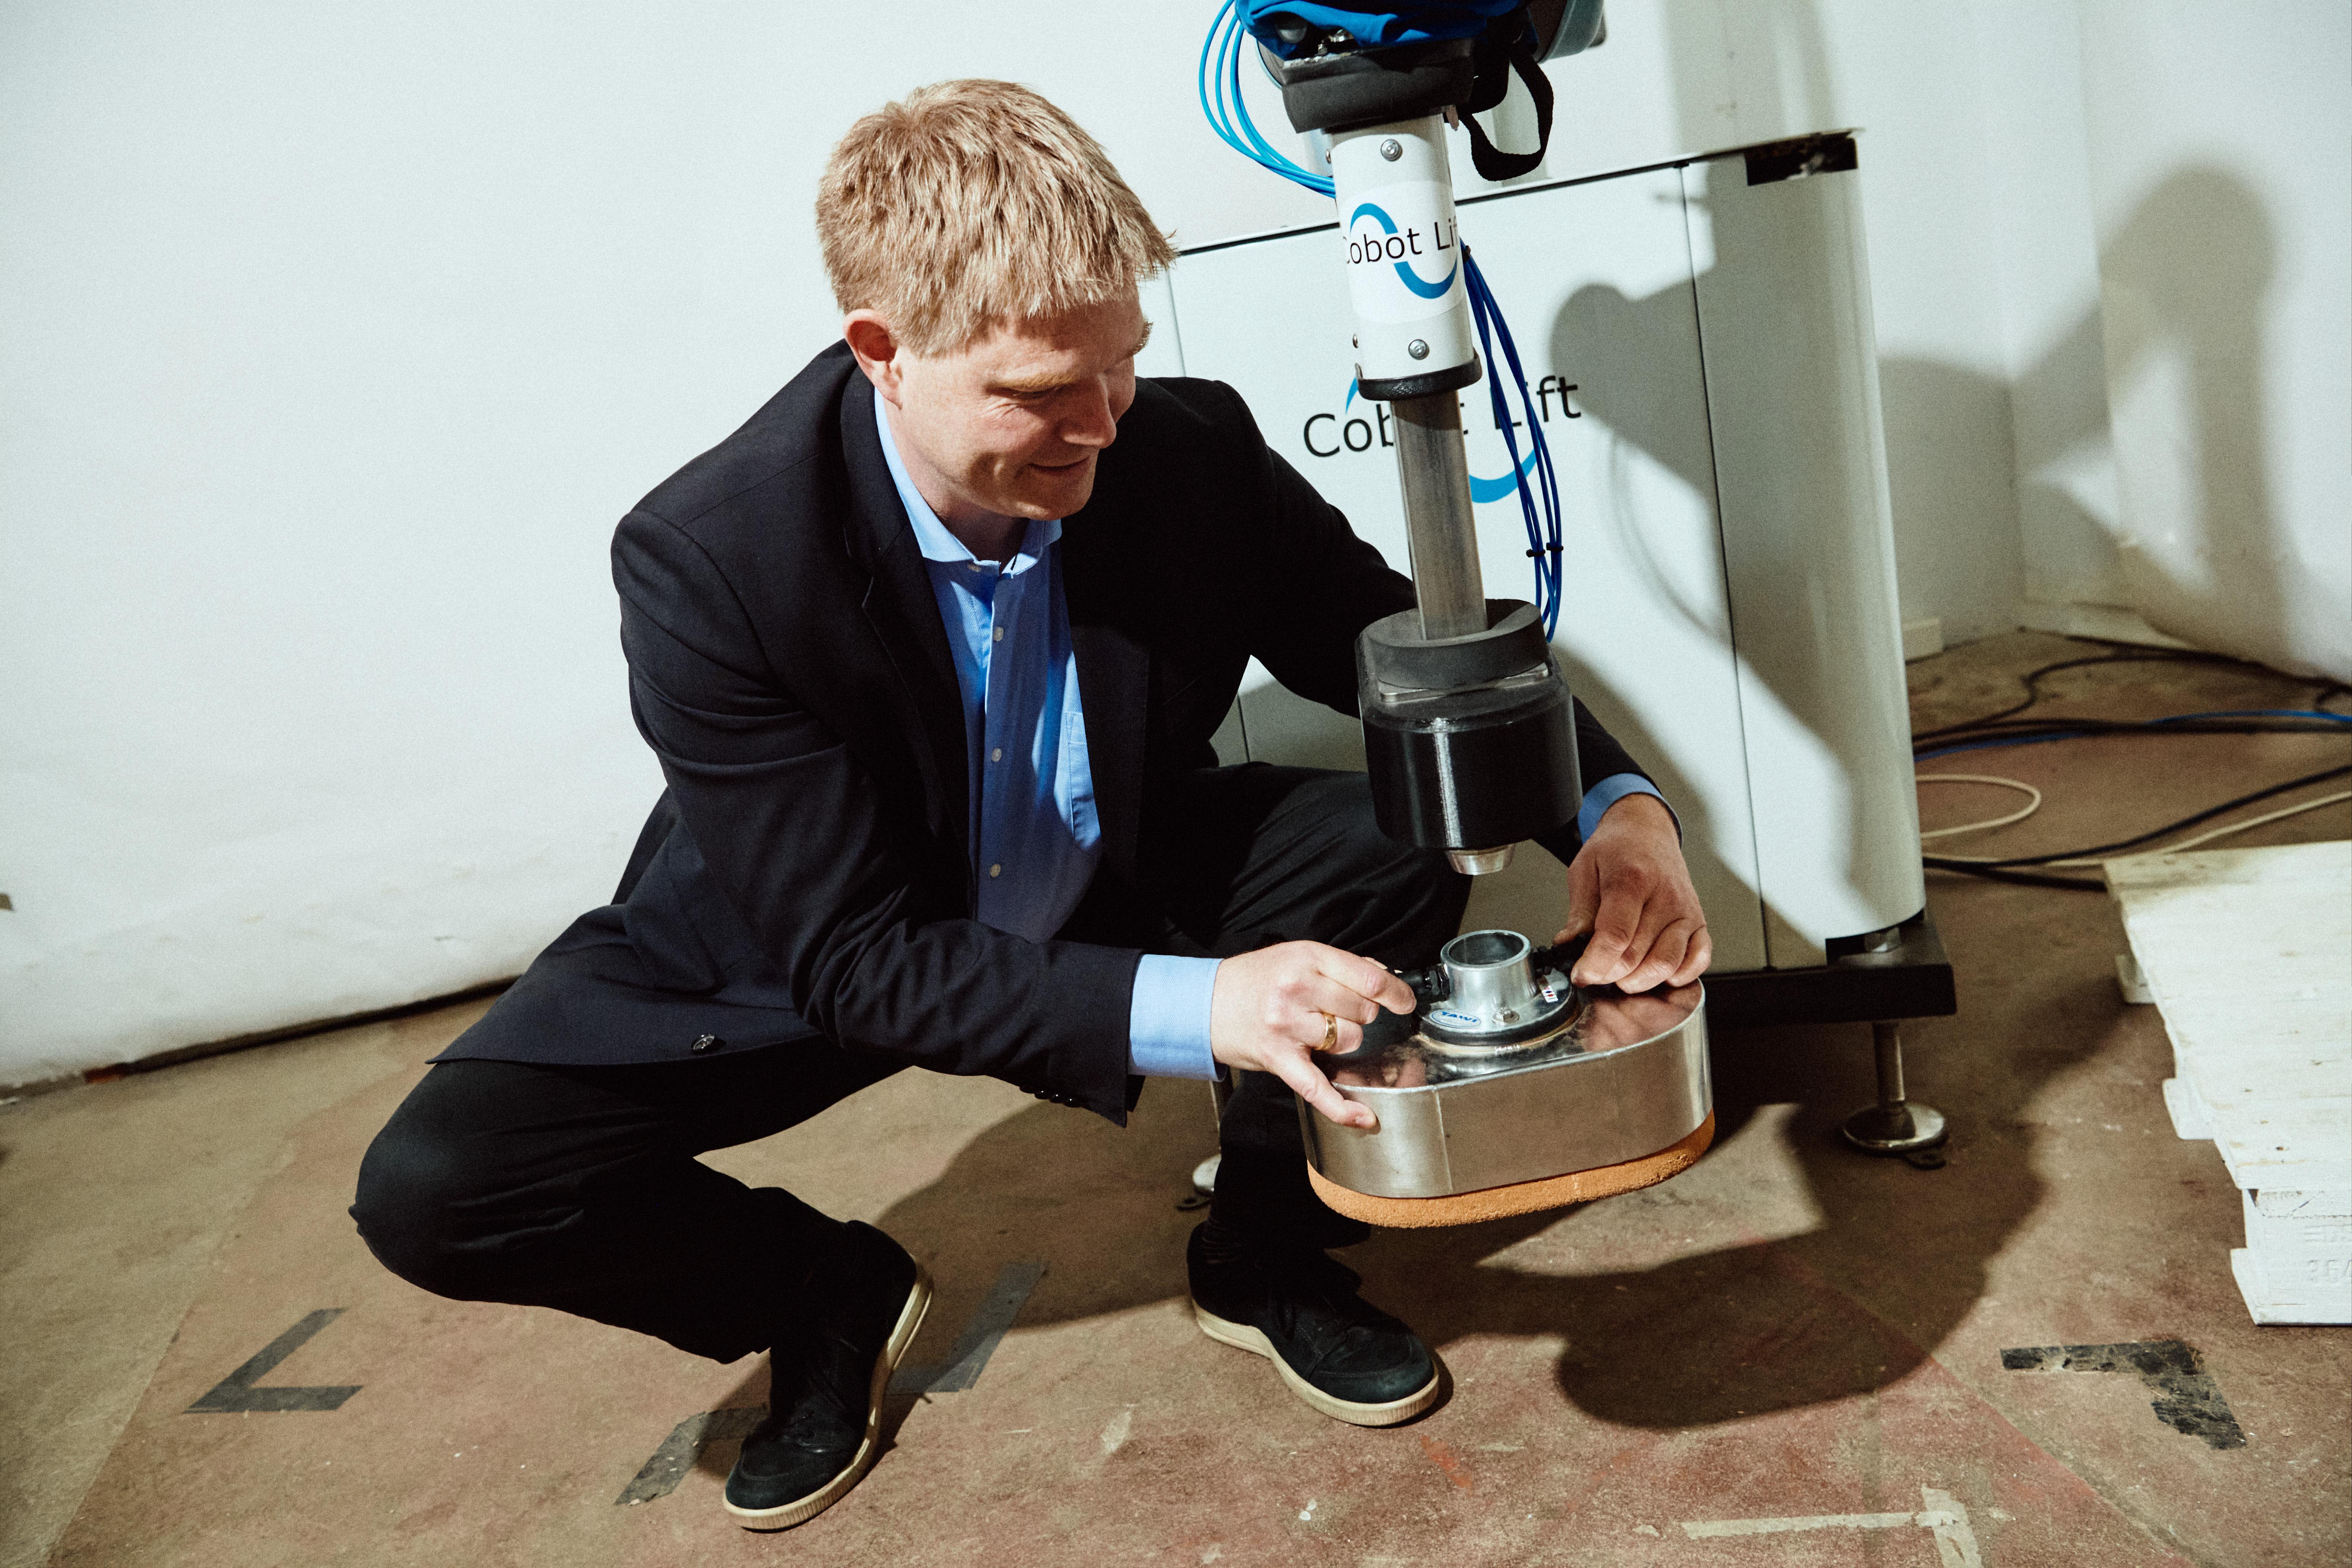 Henrik Elm Gulløv CEO of Cobot Lift demonstrating their robotics solutions